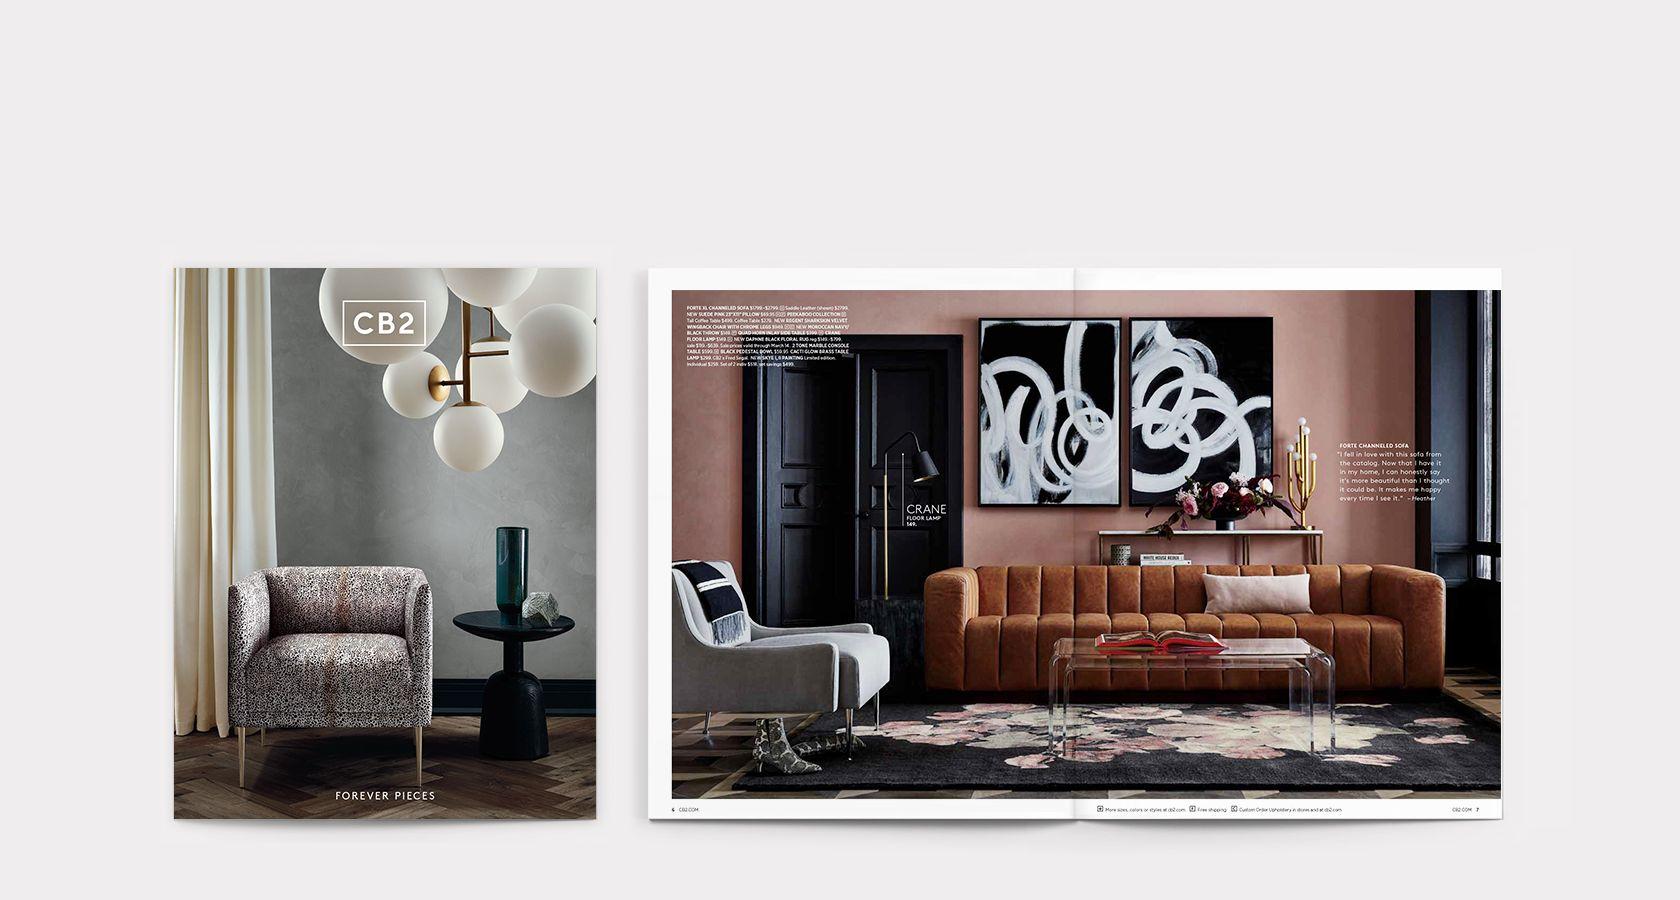 Modern Furniture And Home Decor Cb2